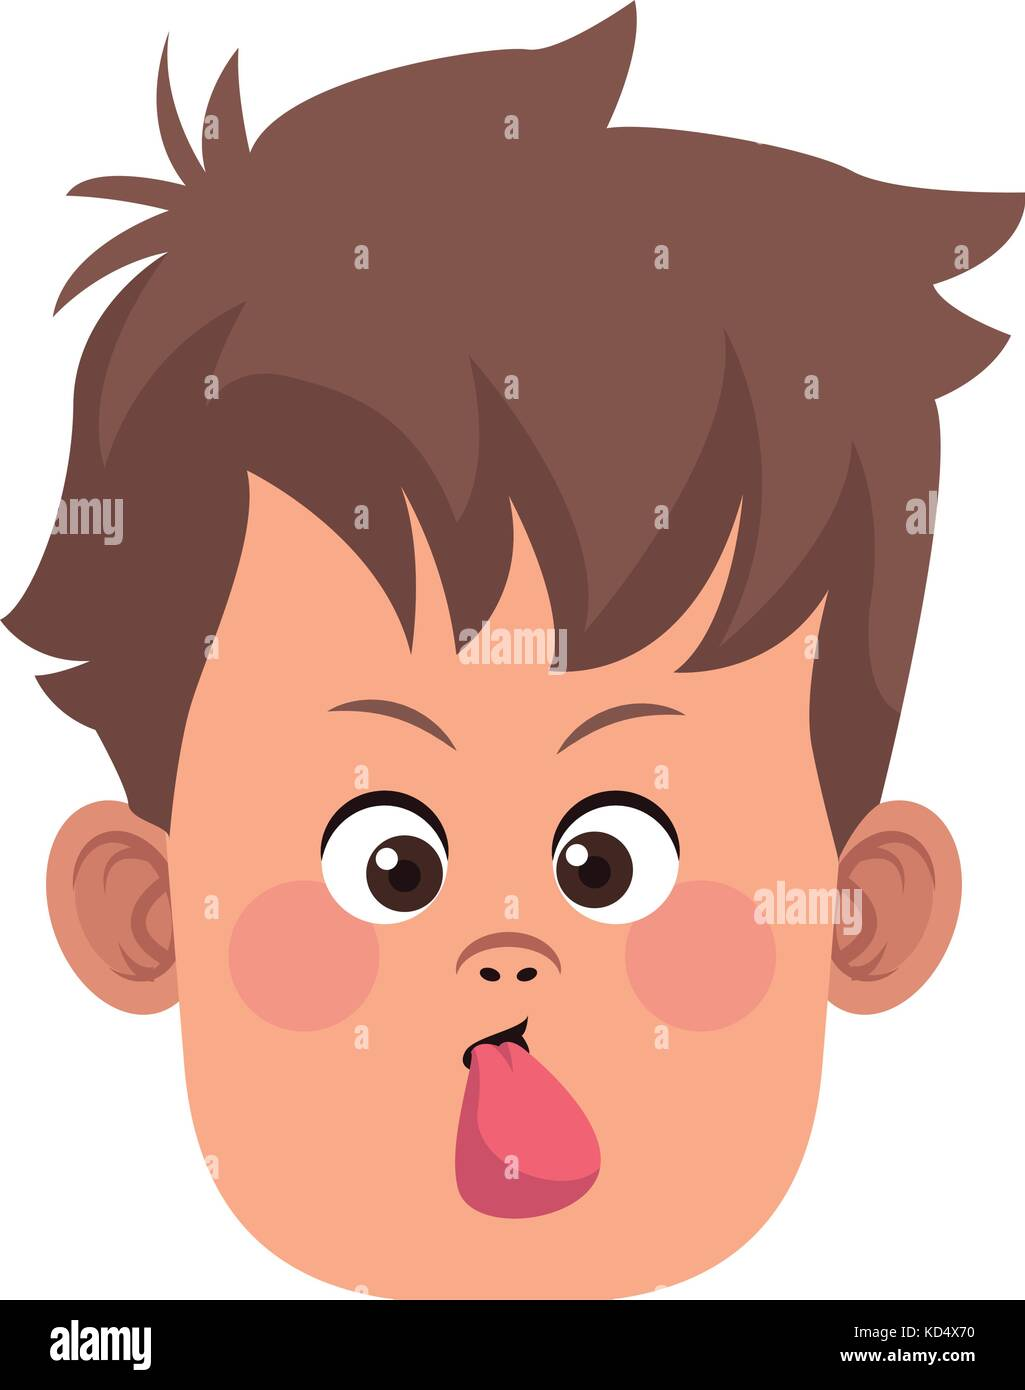 Funny Cartoon Images Of Boys funny boy face stock vector art & illustration, vector image